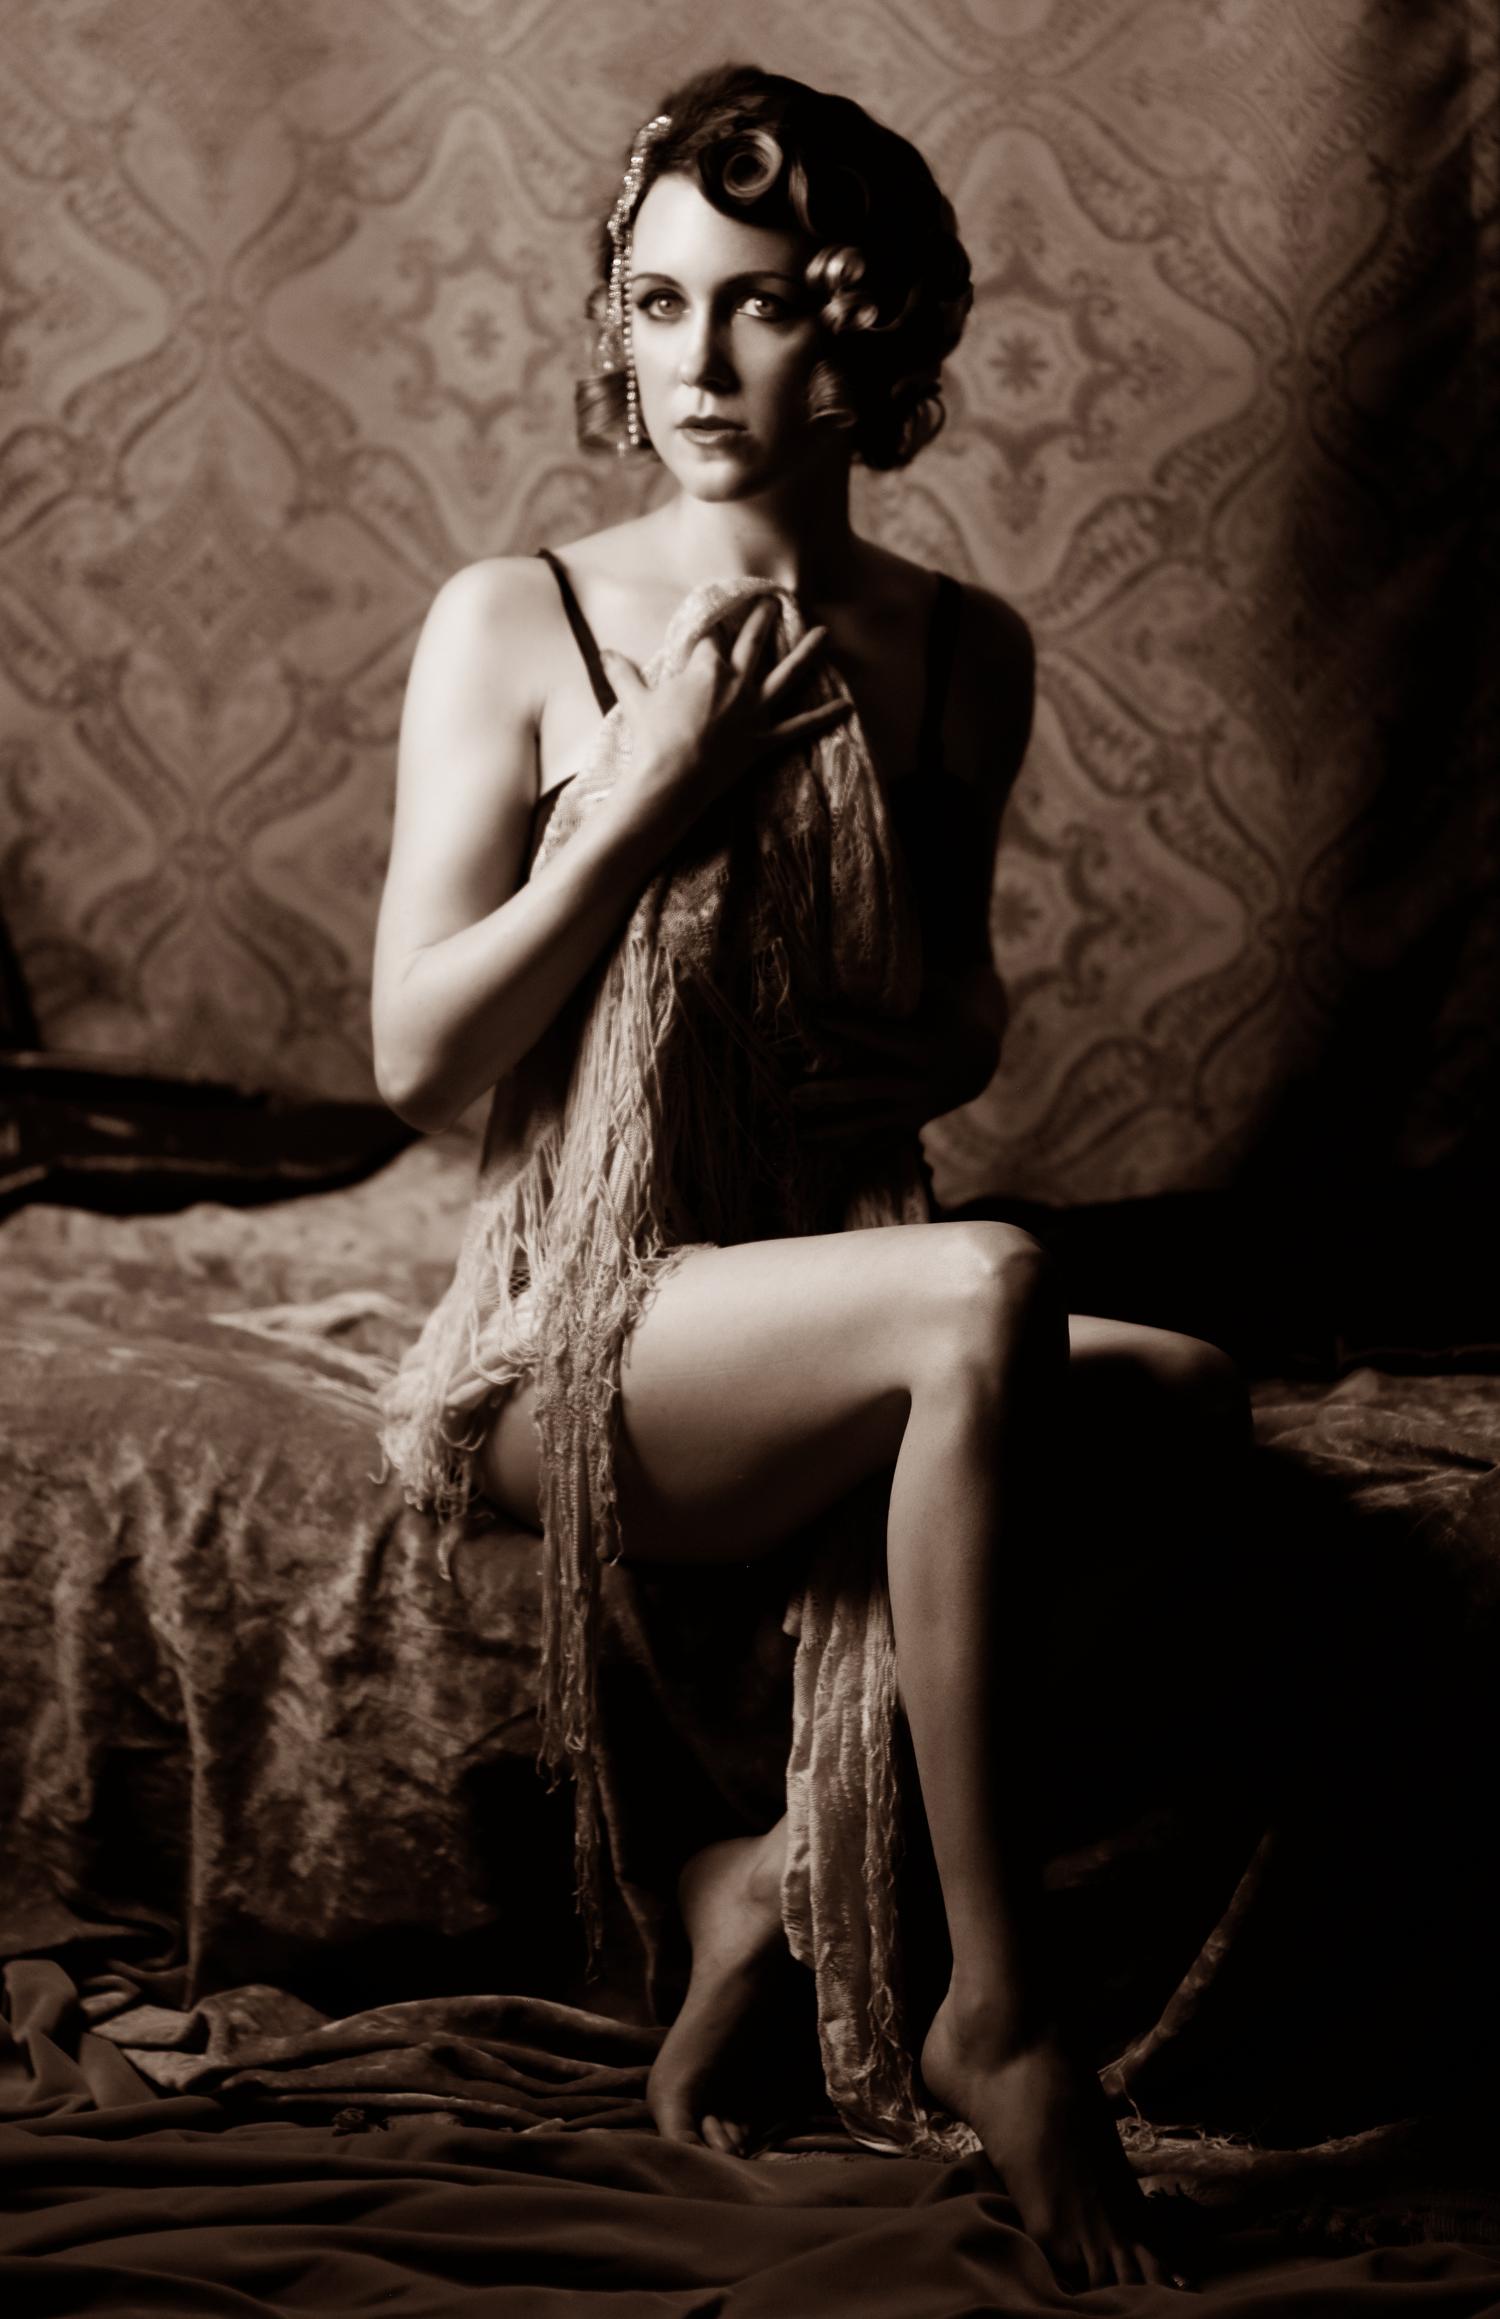 Vintage Photographer Denver 1920s Style by La Photographie 10.jpg